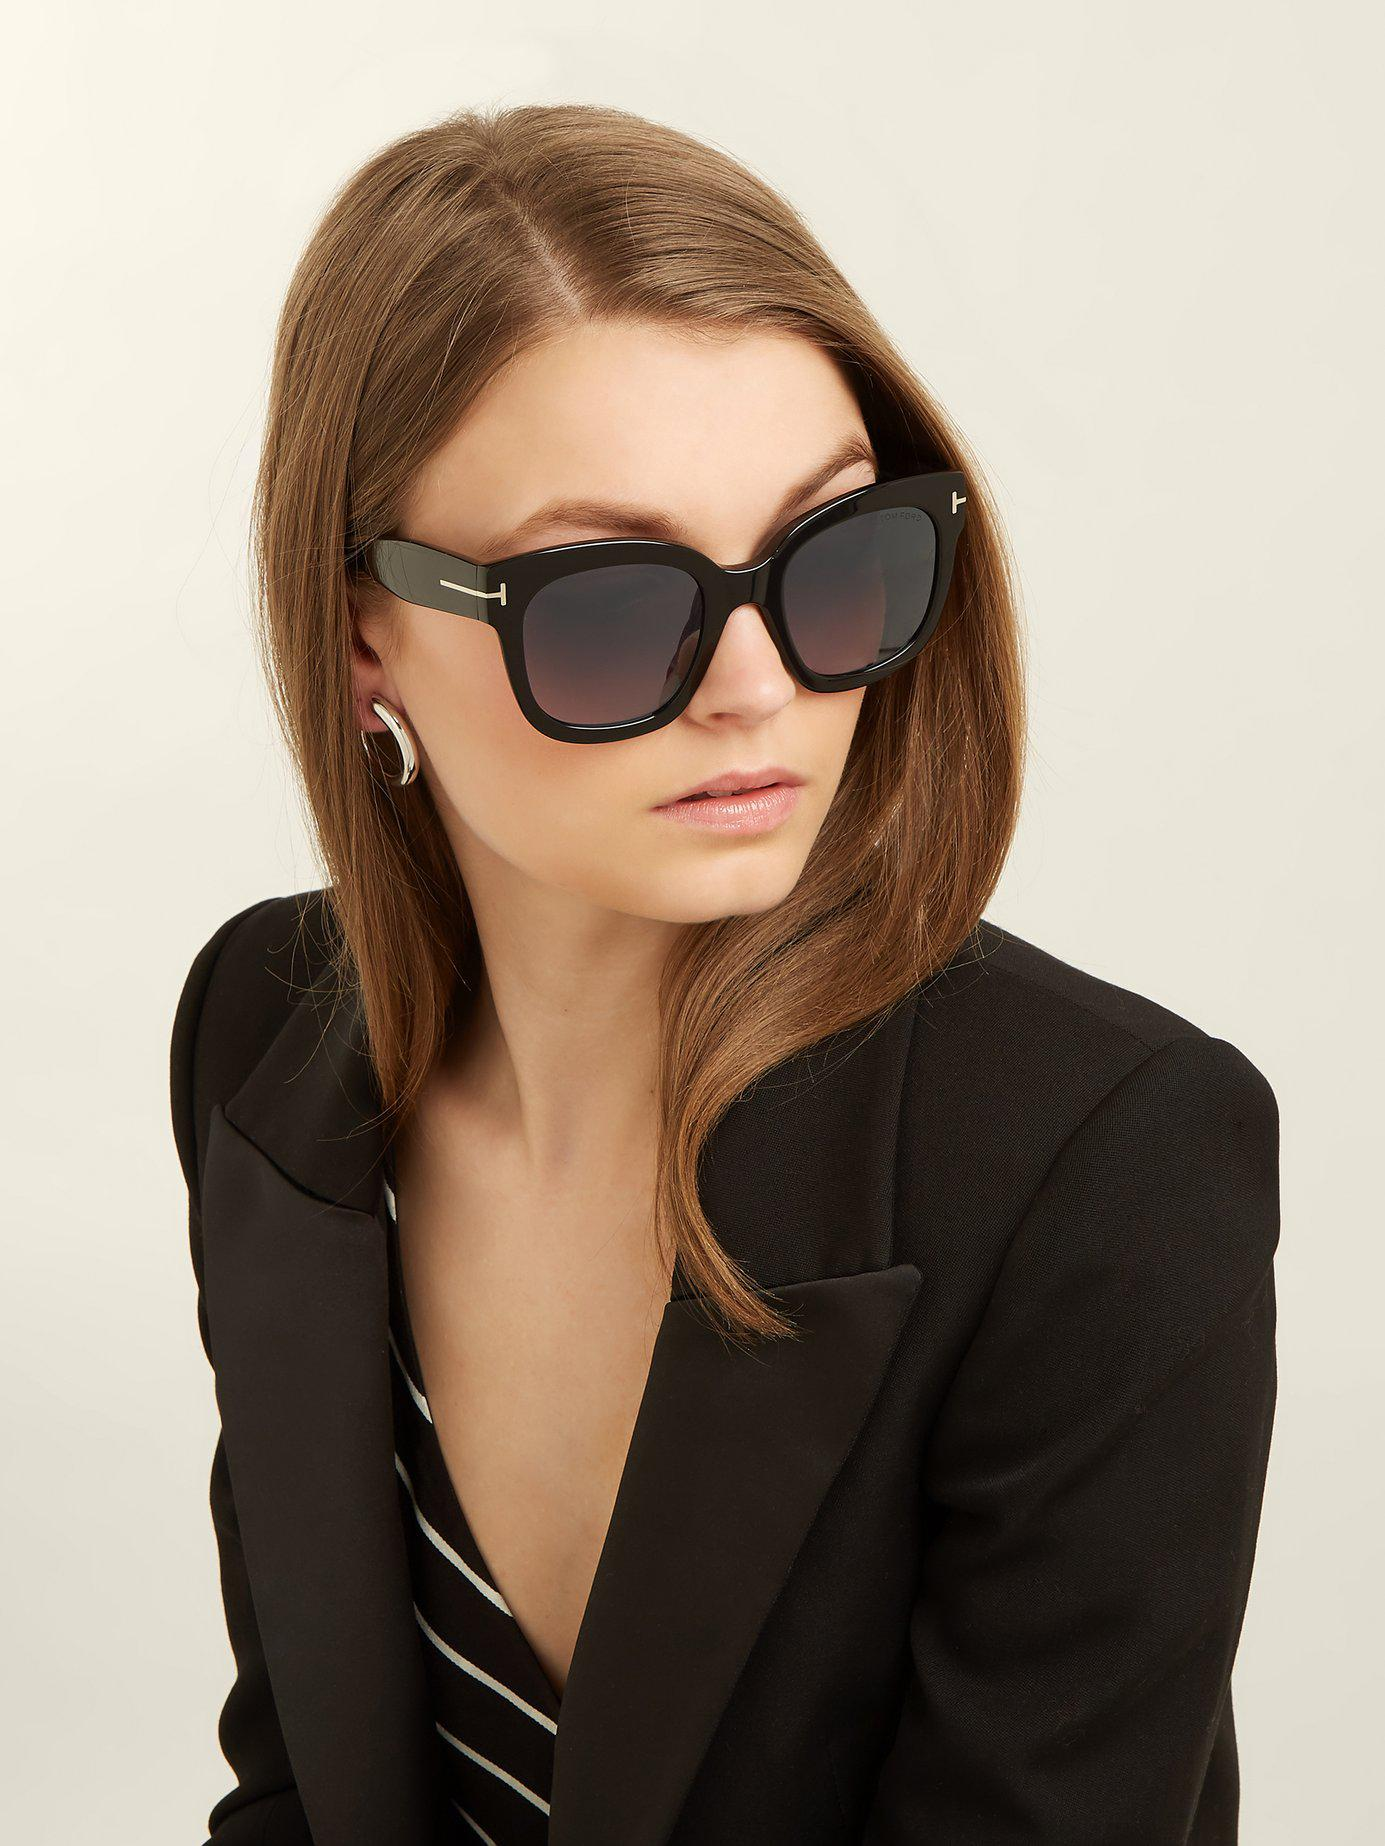 c05f0a452a Lyst - Tom Ford Beatrix Square Frame Sunglasses in Black